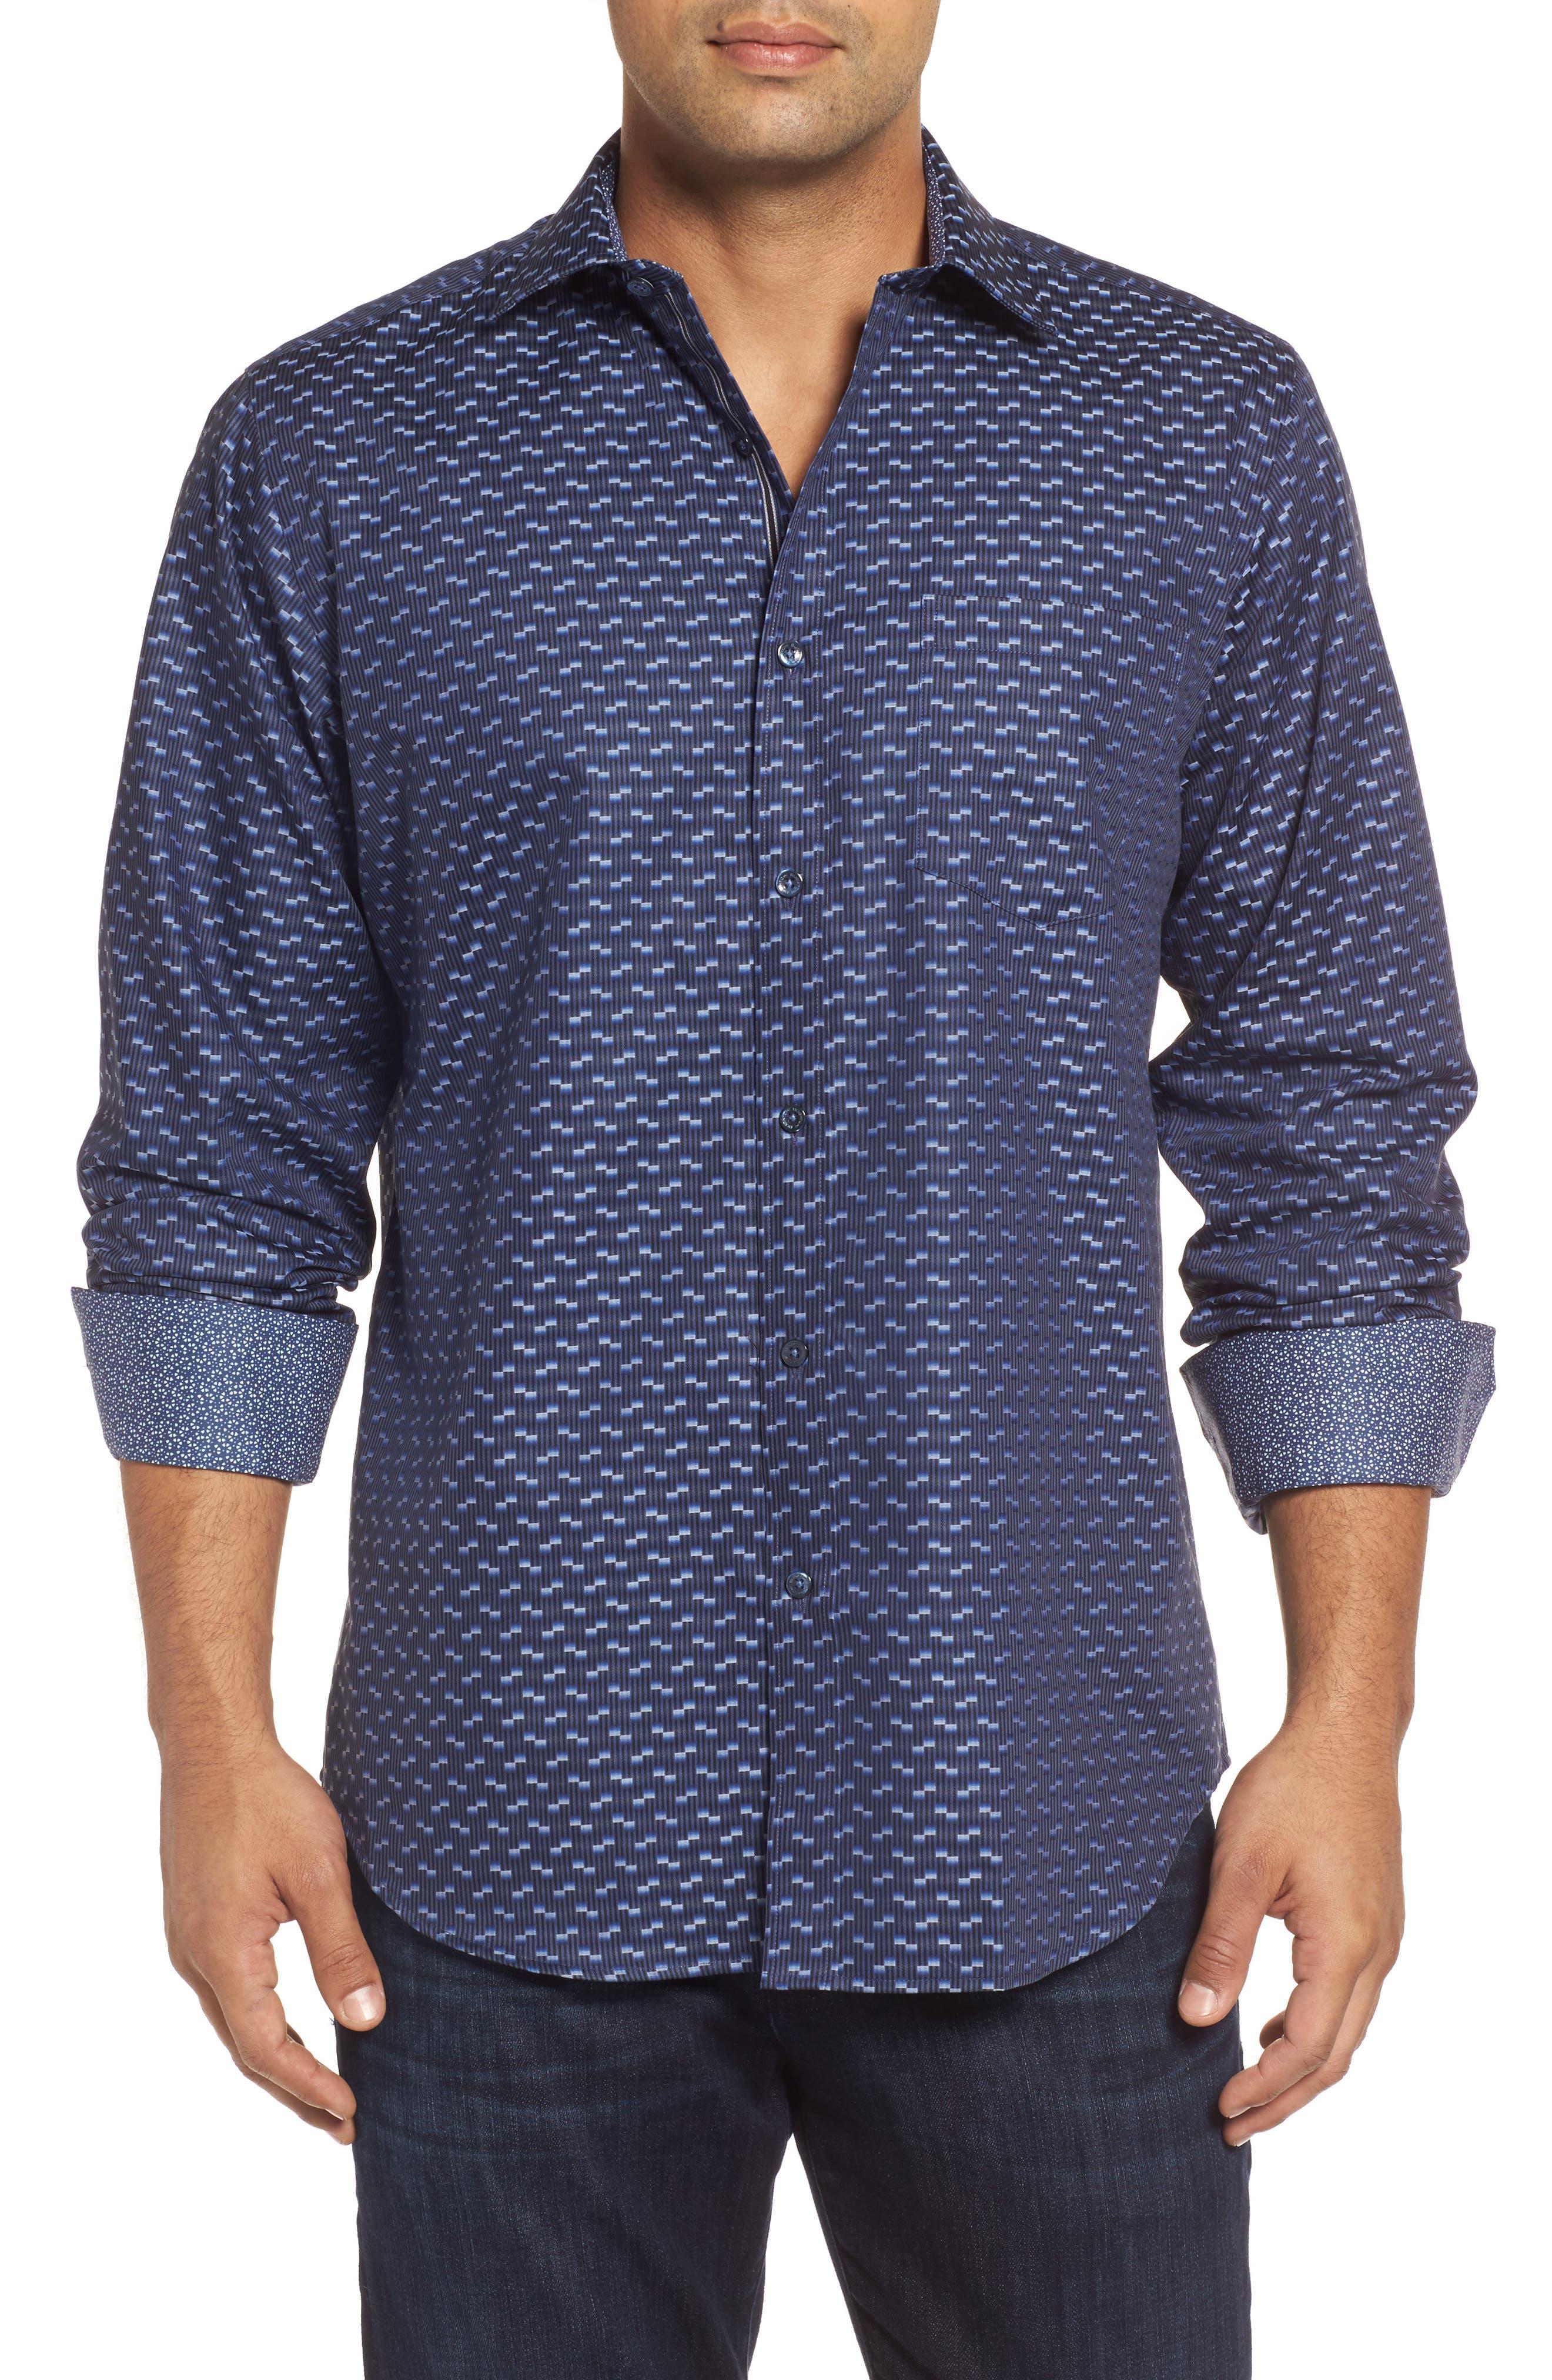 Alternate Image 1 Selected - Bugatchi Classic Fit Geo Jacquard Sport Shirt